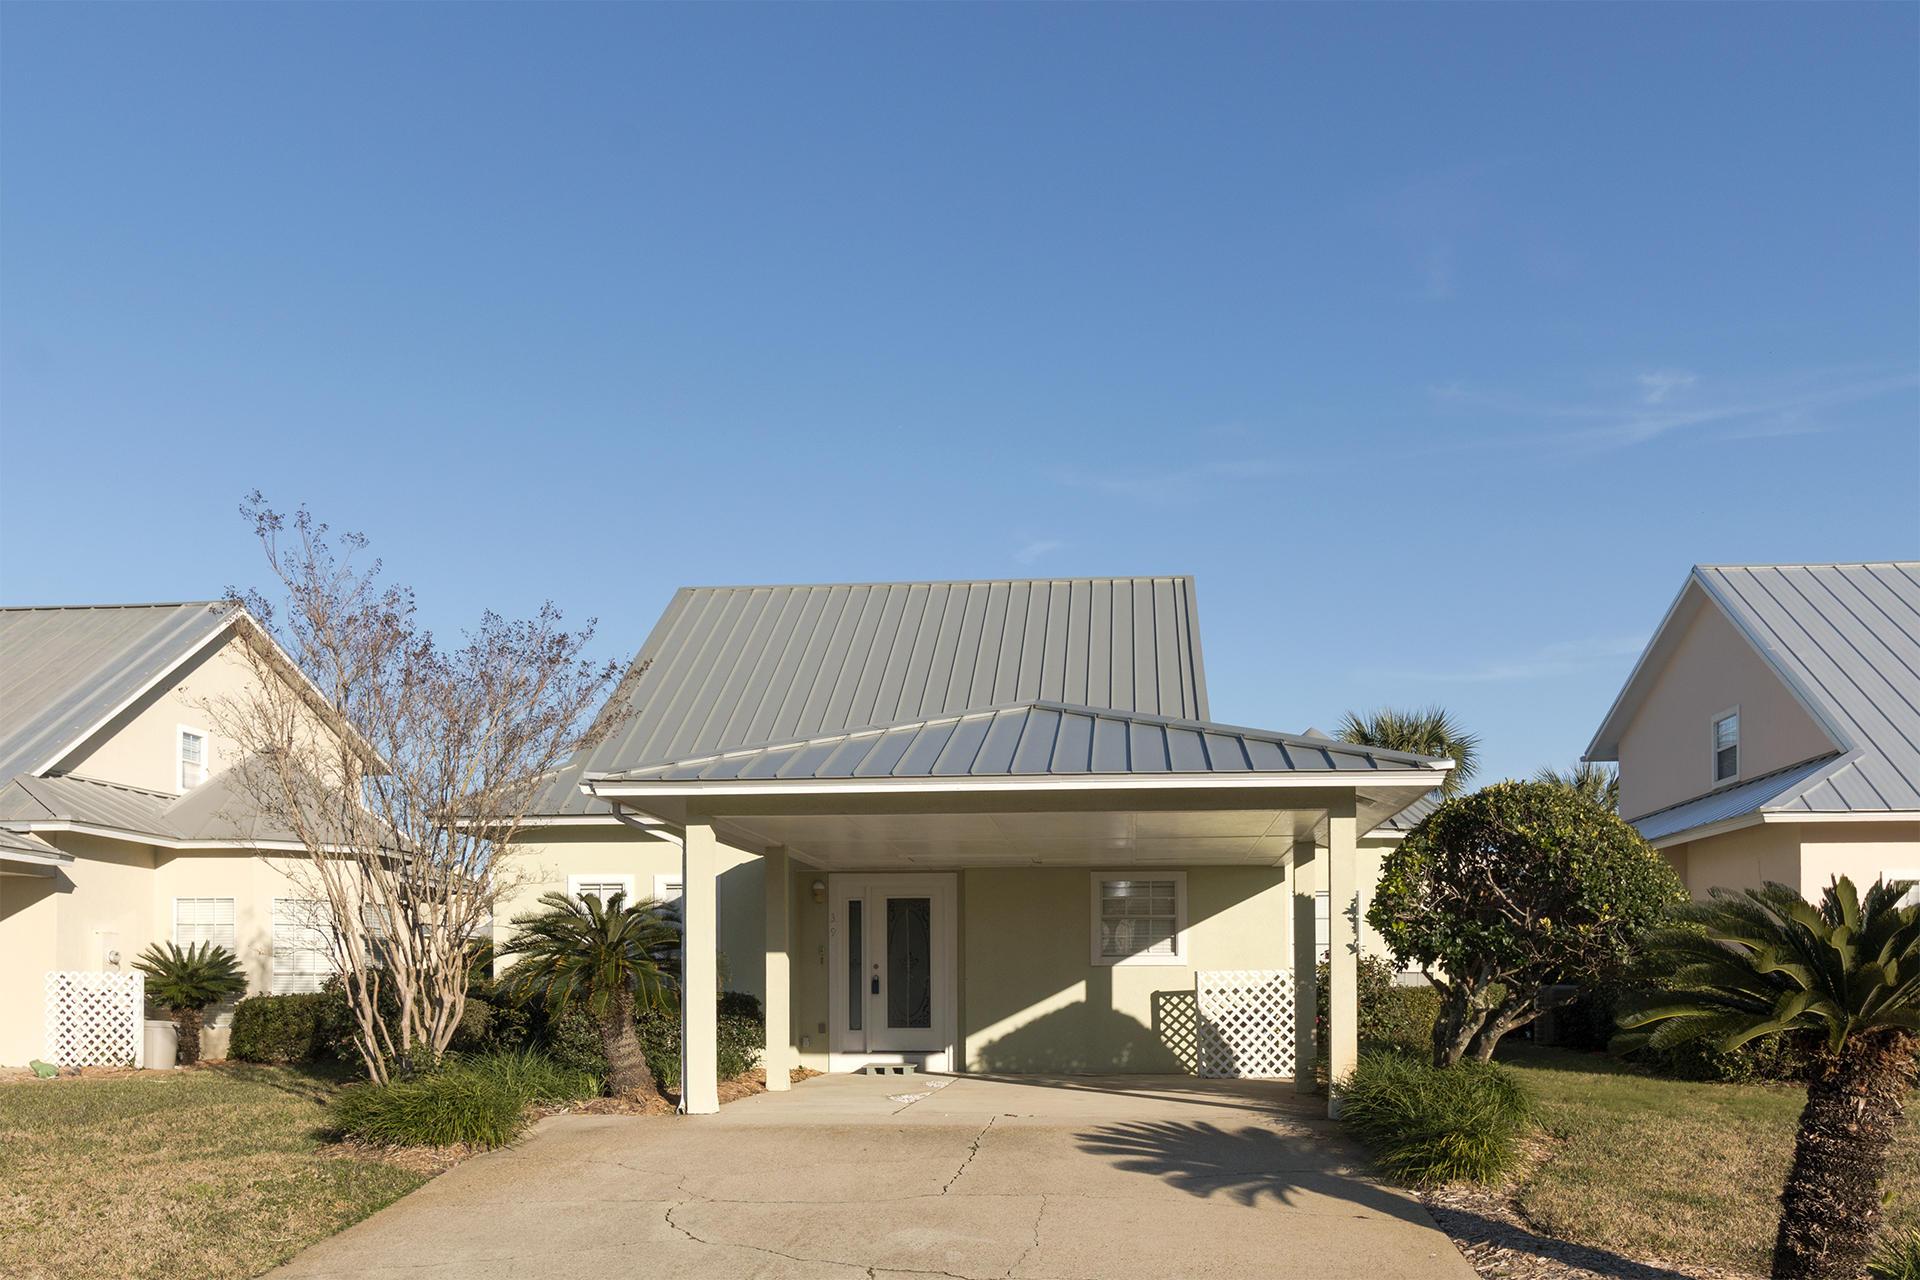 Miramar Beach Real Estate Listing, featured MLS property E809423